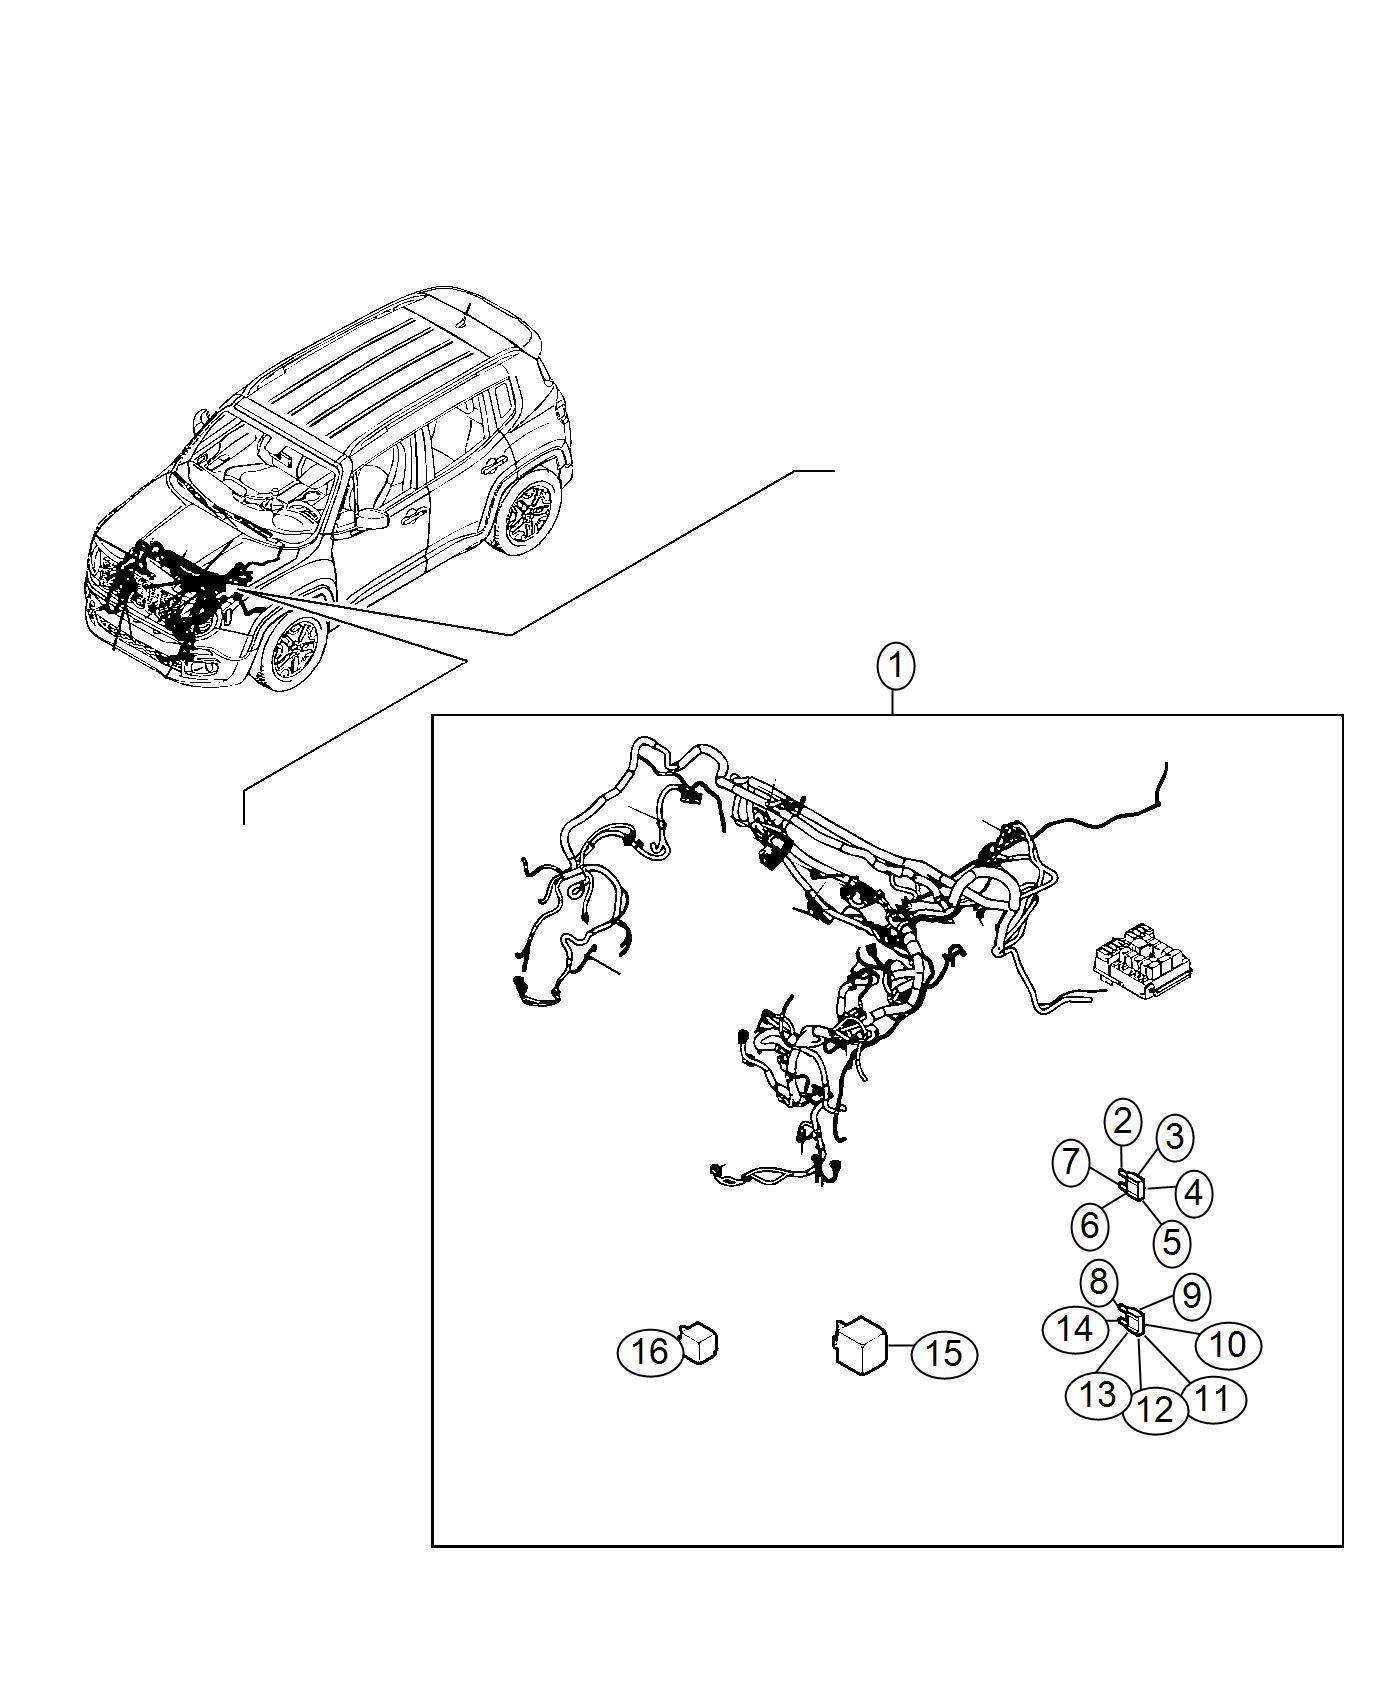 2016 Jeep Renegade Fuse. Maxi. 40 amp, orange. Canada